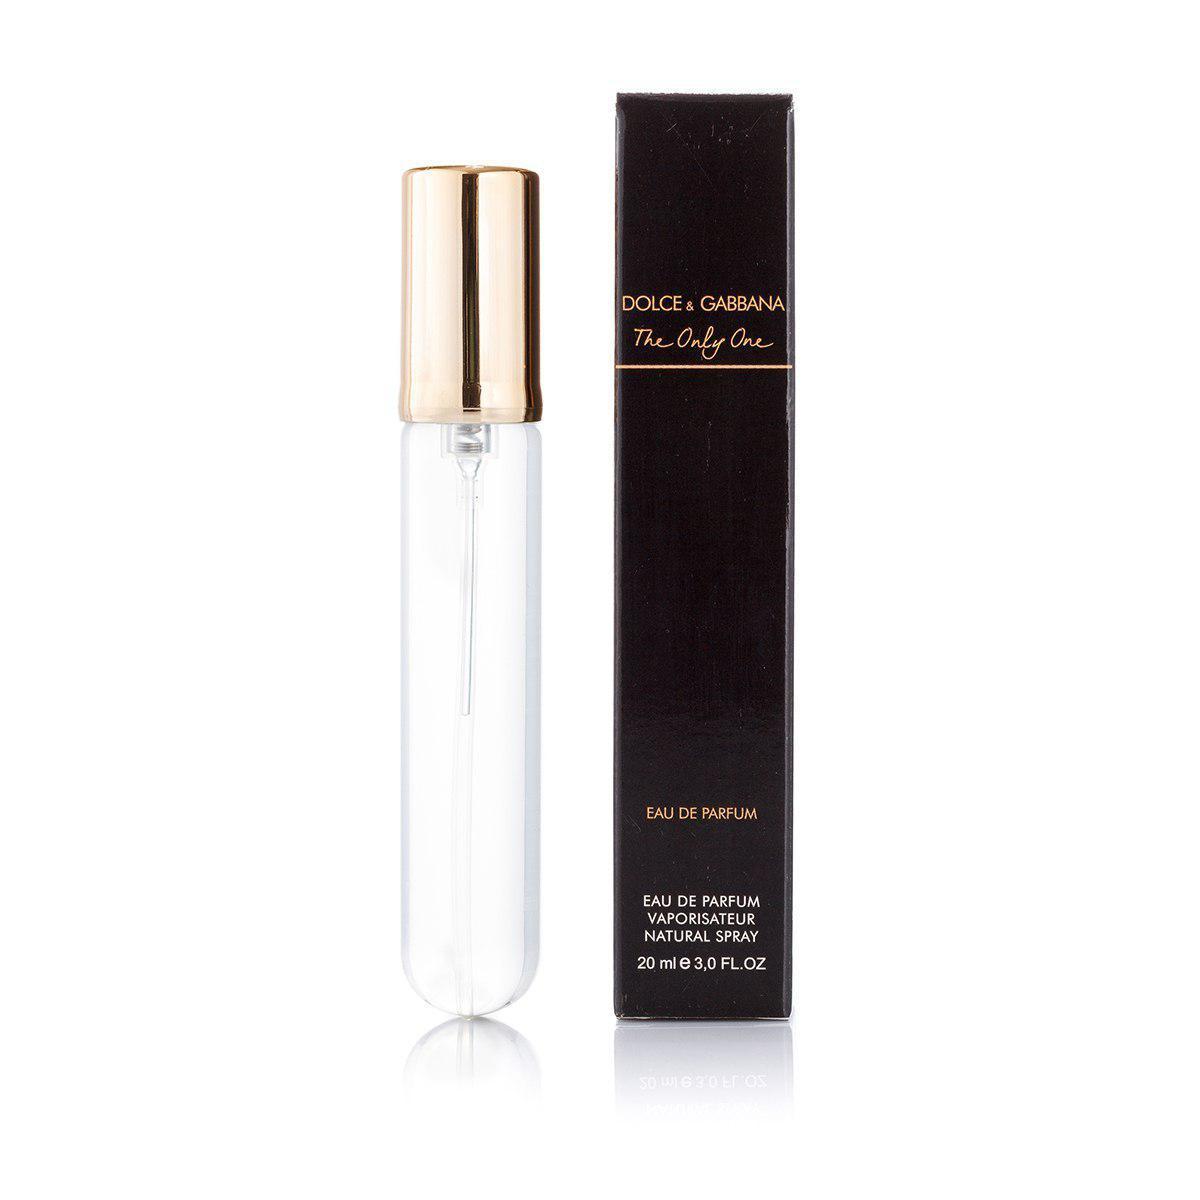 Женский мини-парфюм в ручке Dolce & Gabbana The Only One - 20 мл